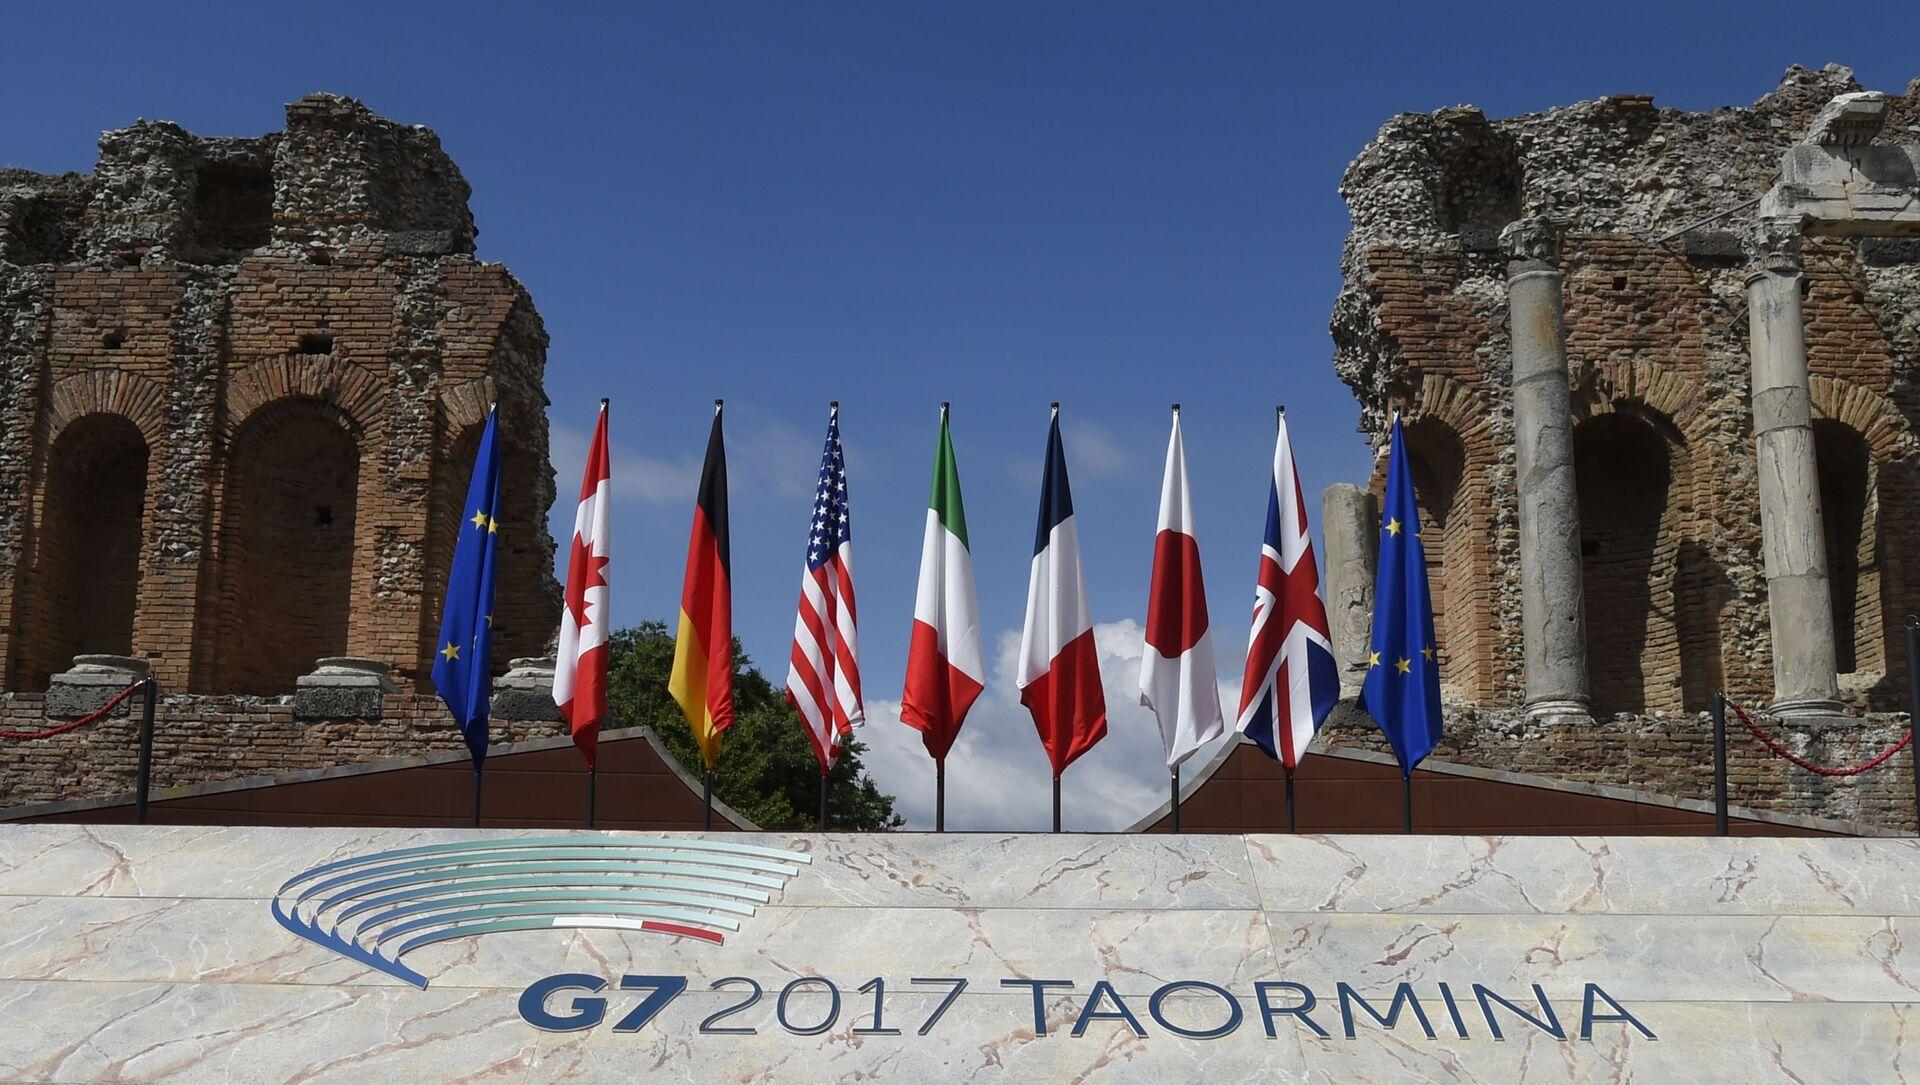 Флаги Евросоюза и стран G7, фото из архива - Sputnik Азербайджан, 1920, 13.06.2021